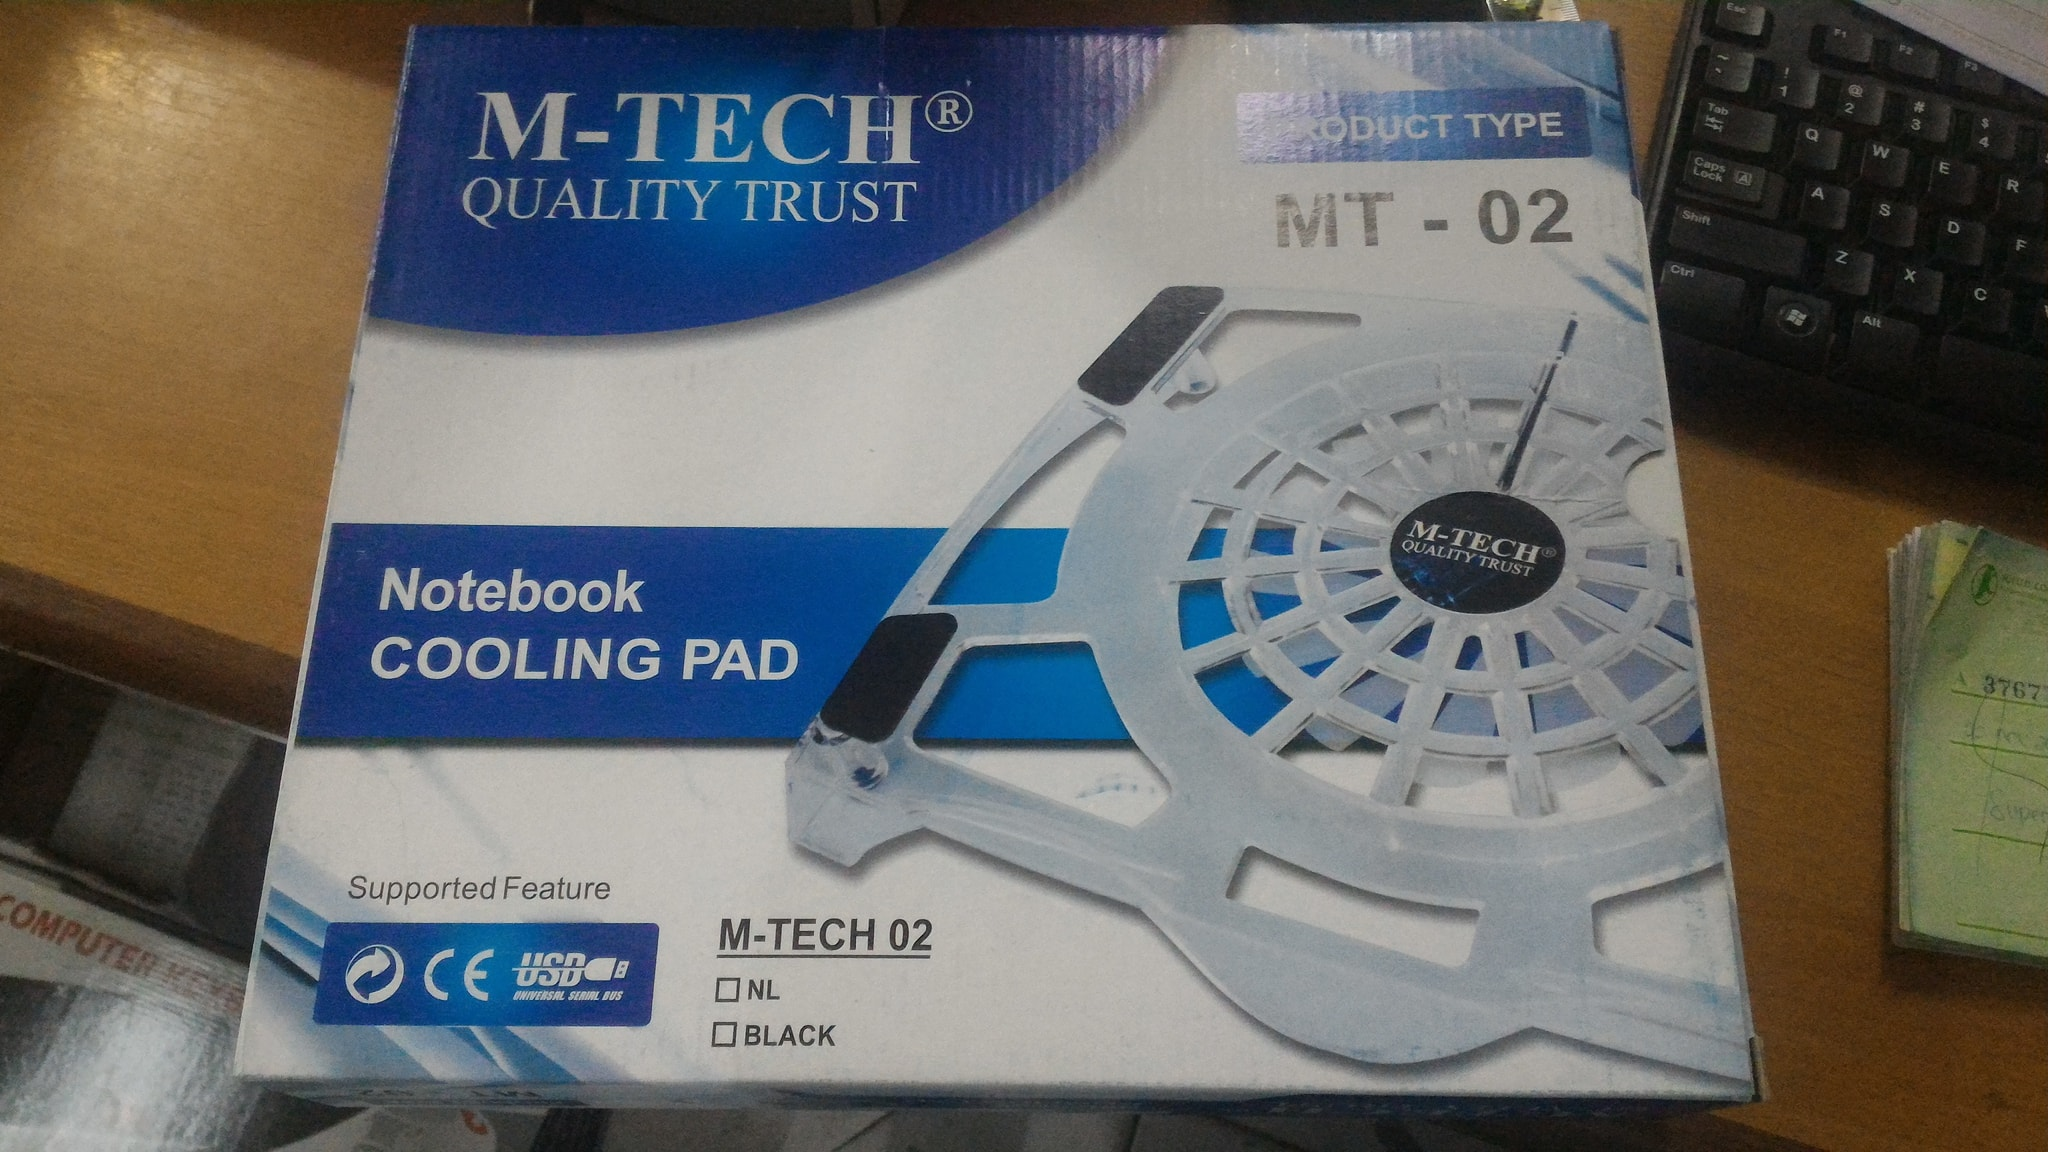 Cooling Pad Kipas Pendingin Notebook Laptop M Tech Mt 02 Daftar Bigfan Coolerpad Nc33 Jual 1 Fan Solusi Computer Tokopedia